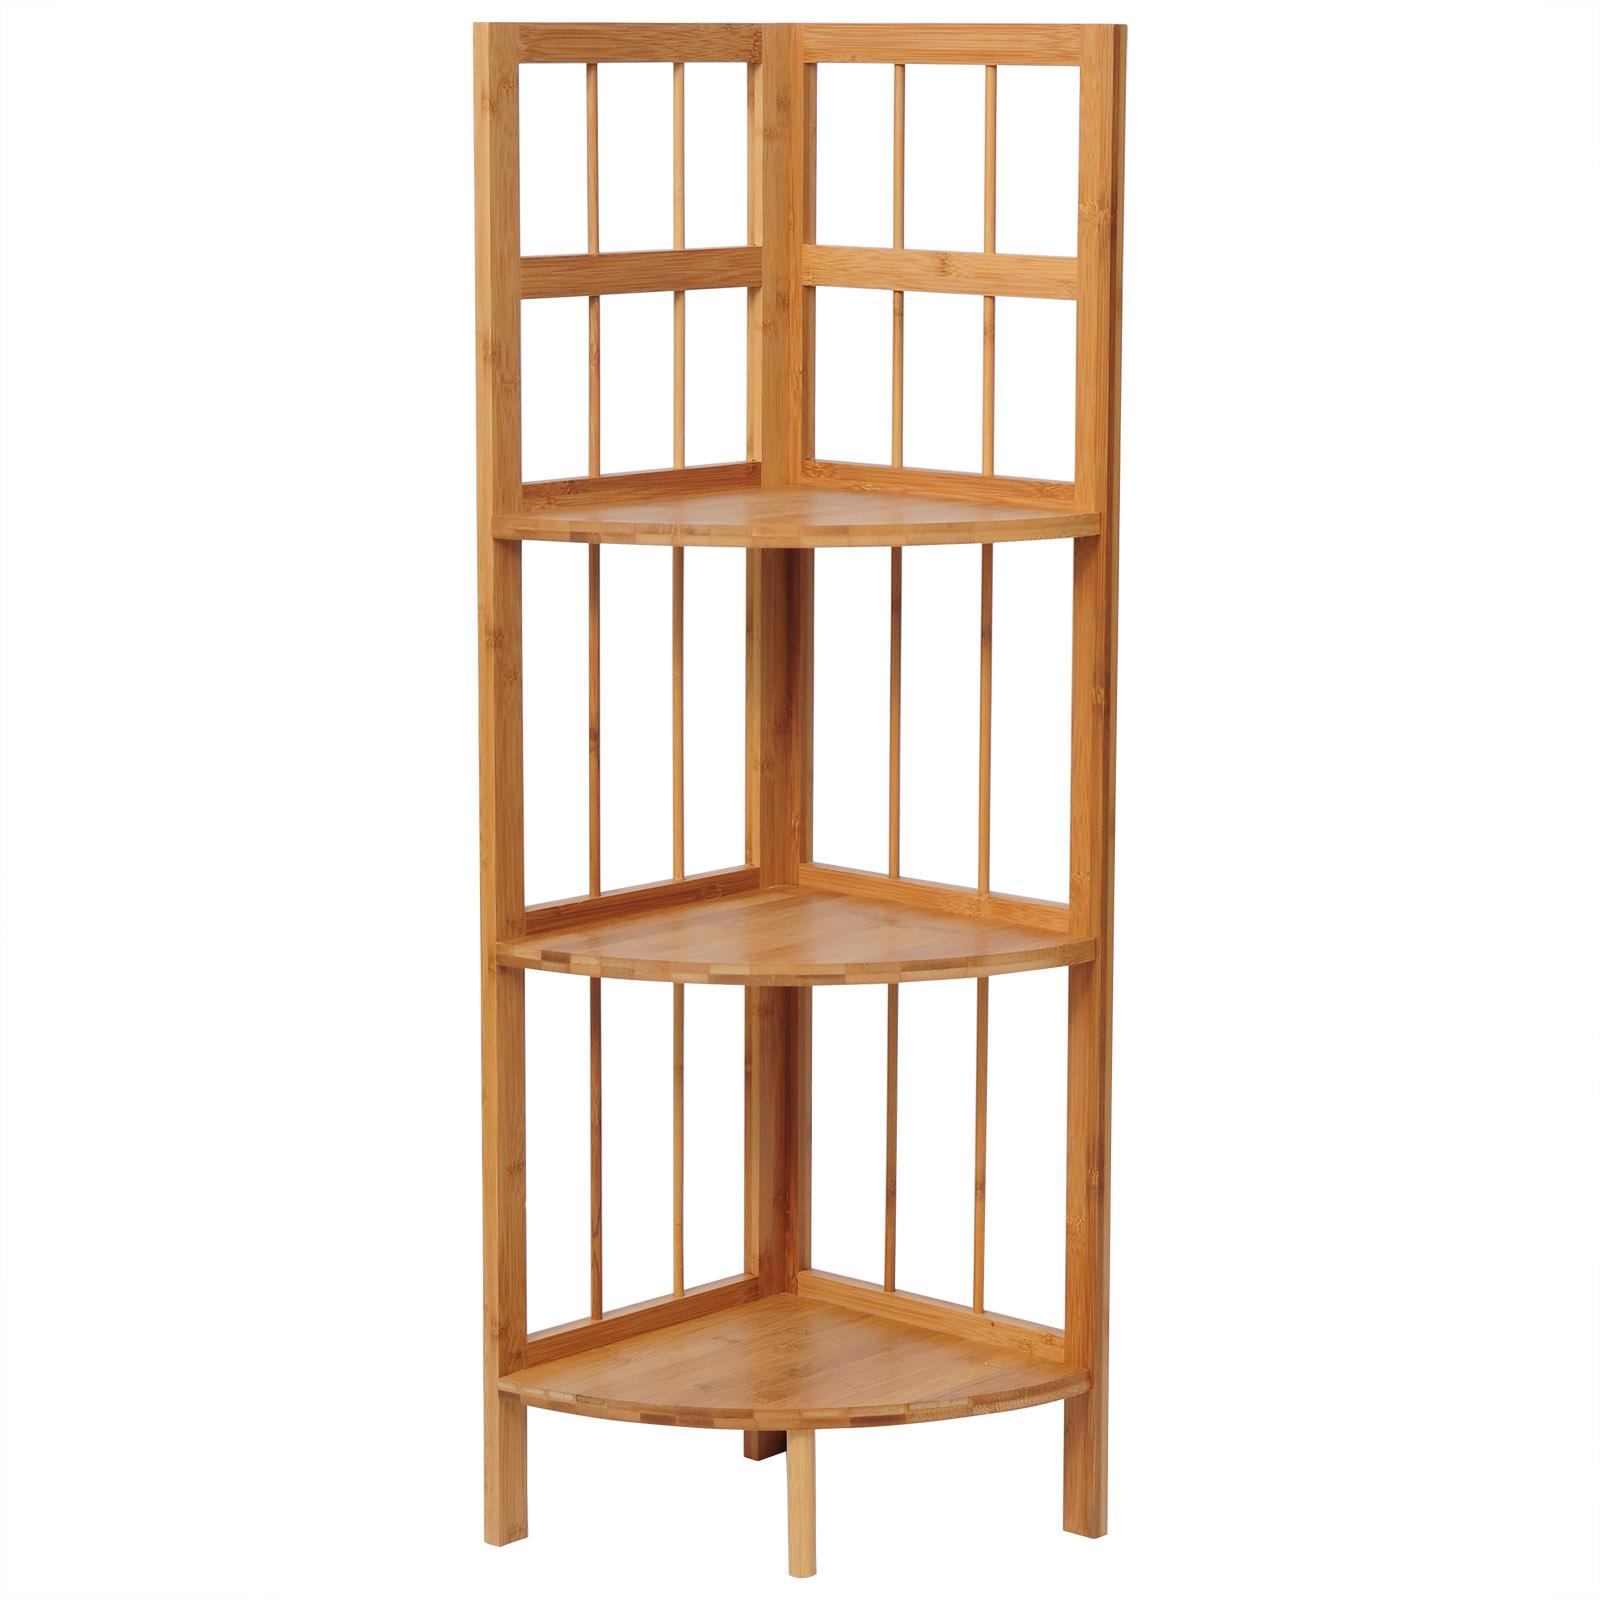 standregal 3 etagen eckregal bambus regal b cherregal. Black Bedroom Furniture Sets. Home Design Ideas